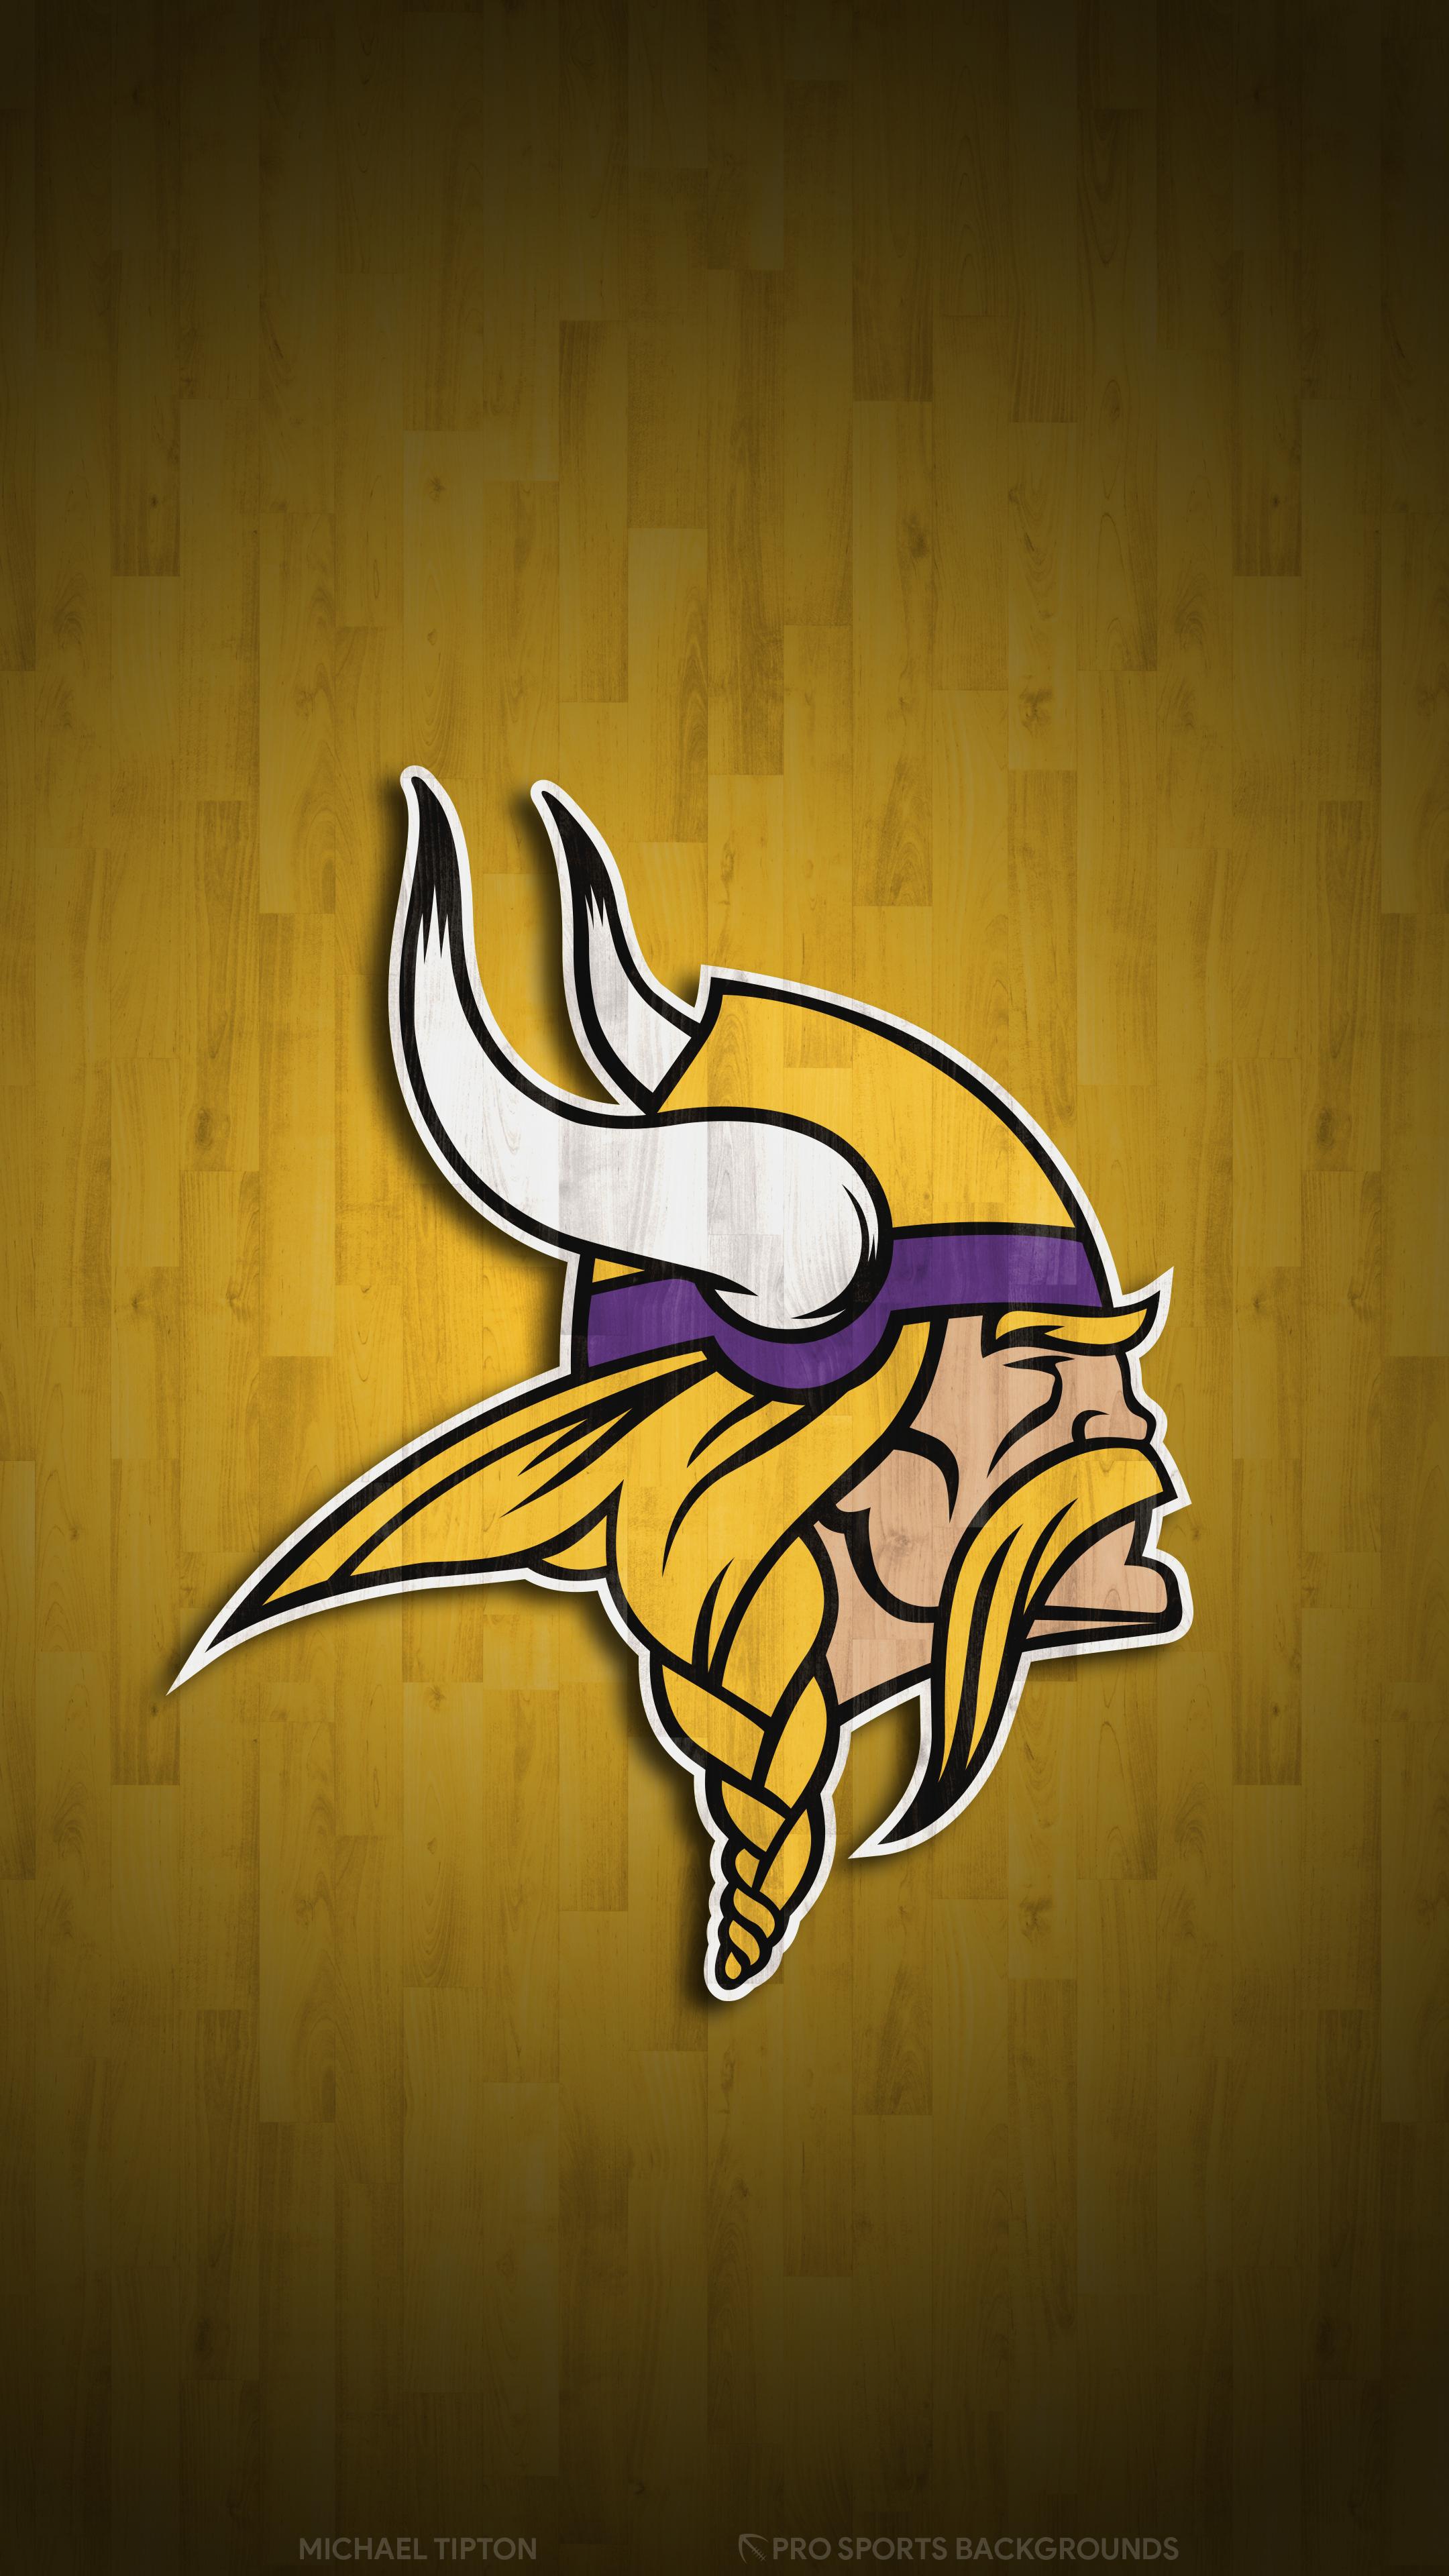 2019 Minnesota Vikings Wallpapers Pro Sports Backgrounds 2160x3840